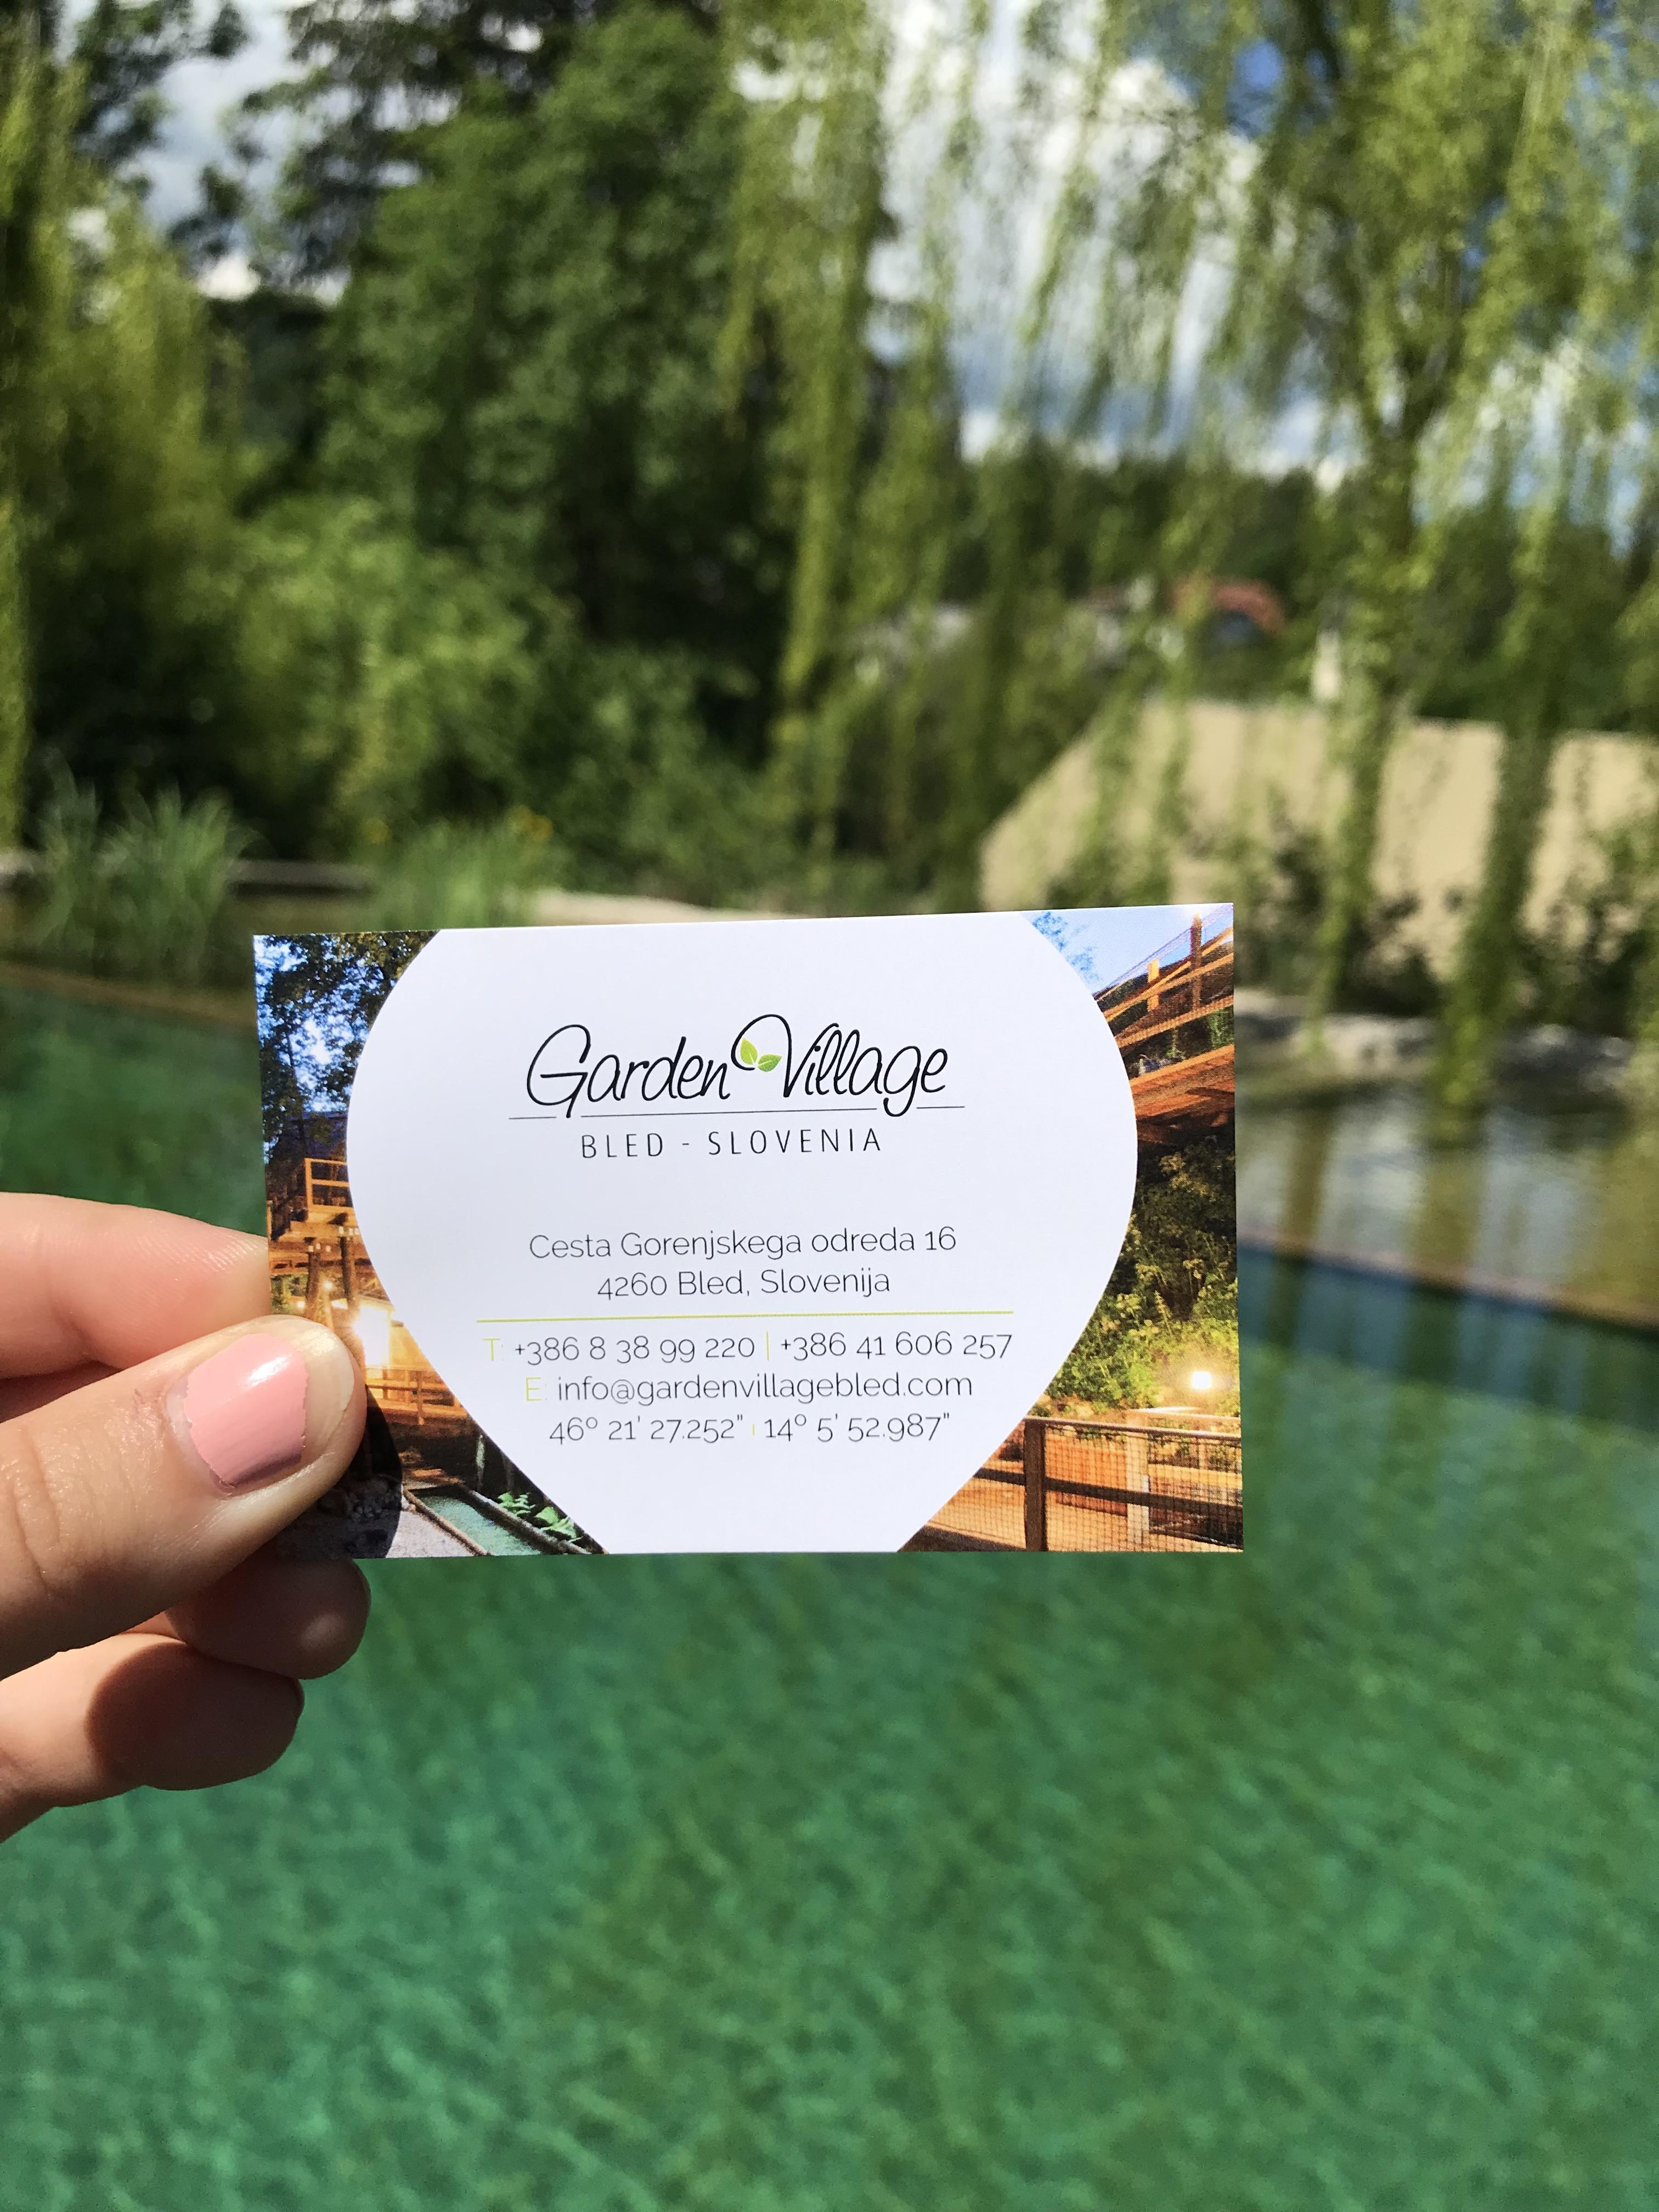 Slovenia's Garden Village Glamping Tent